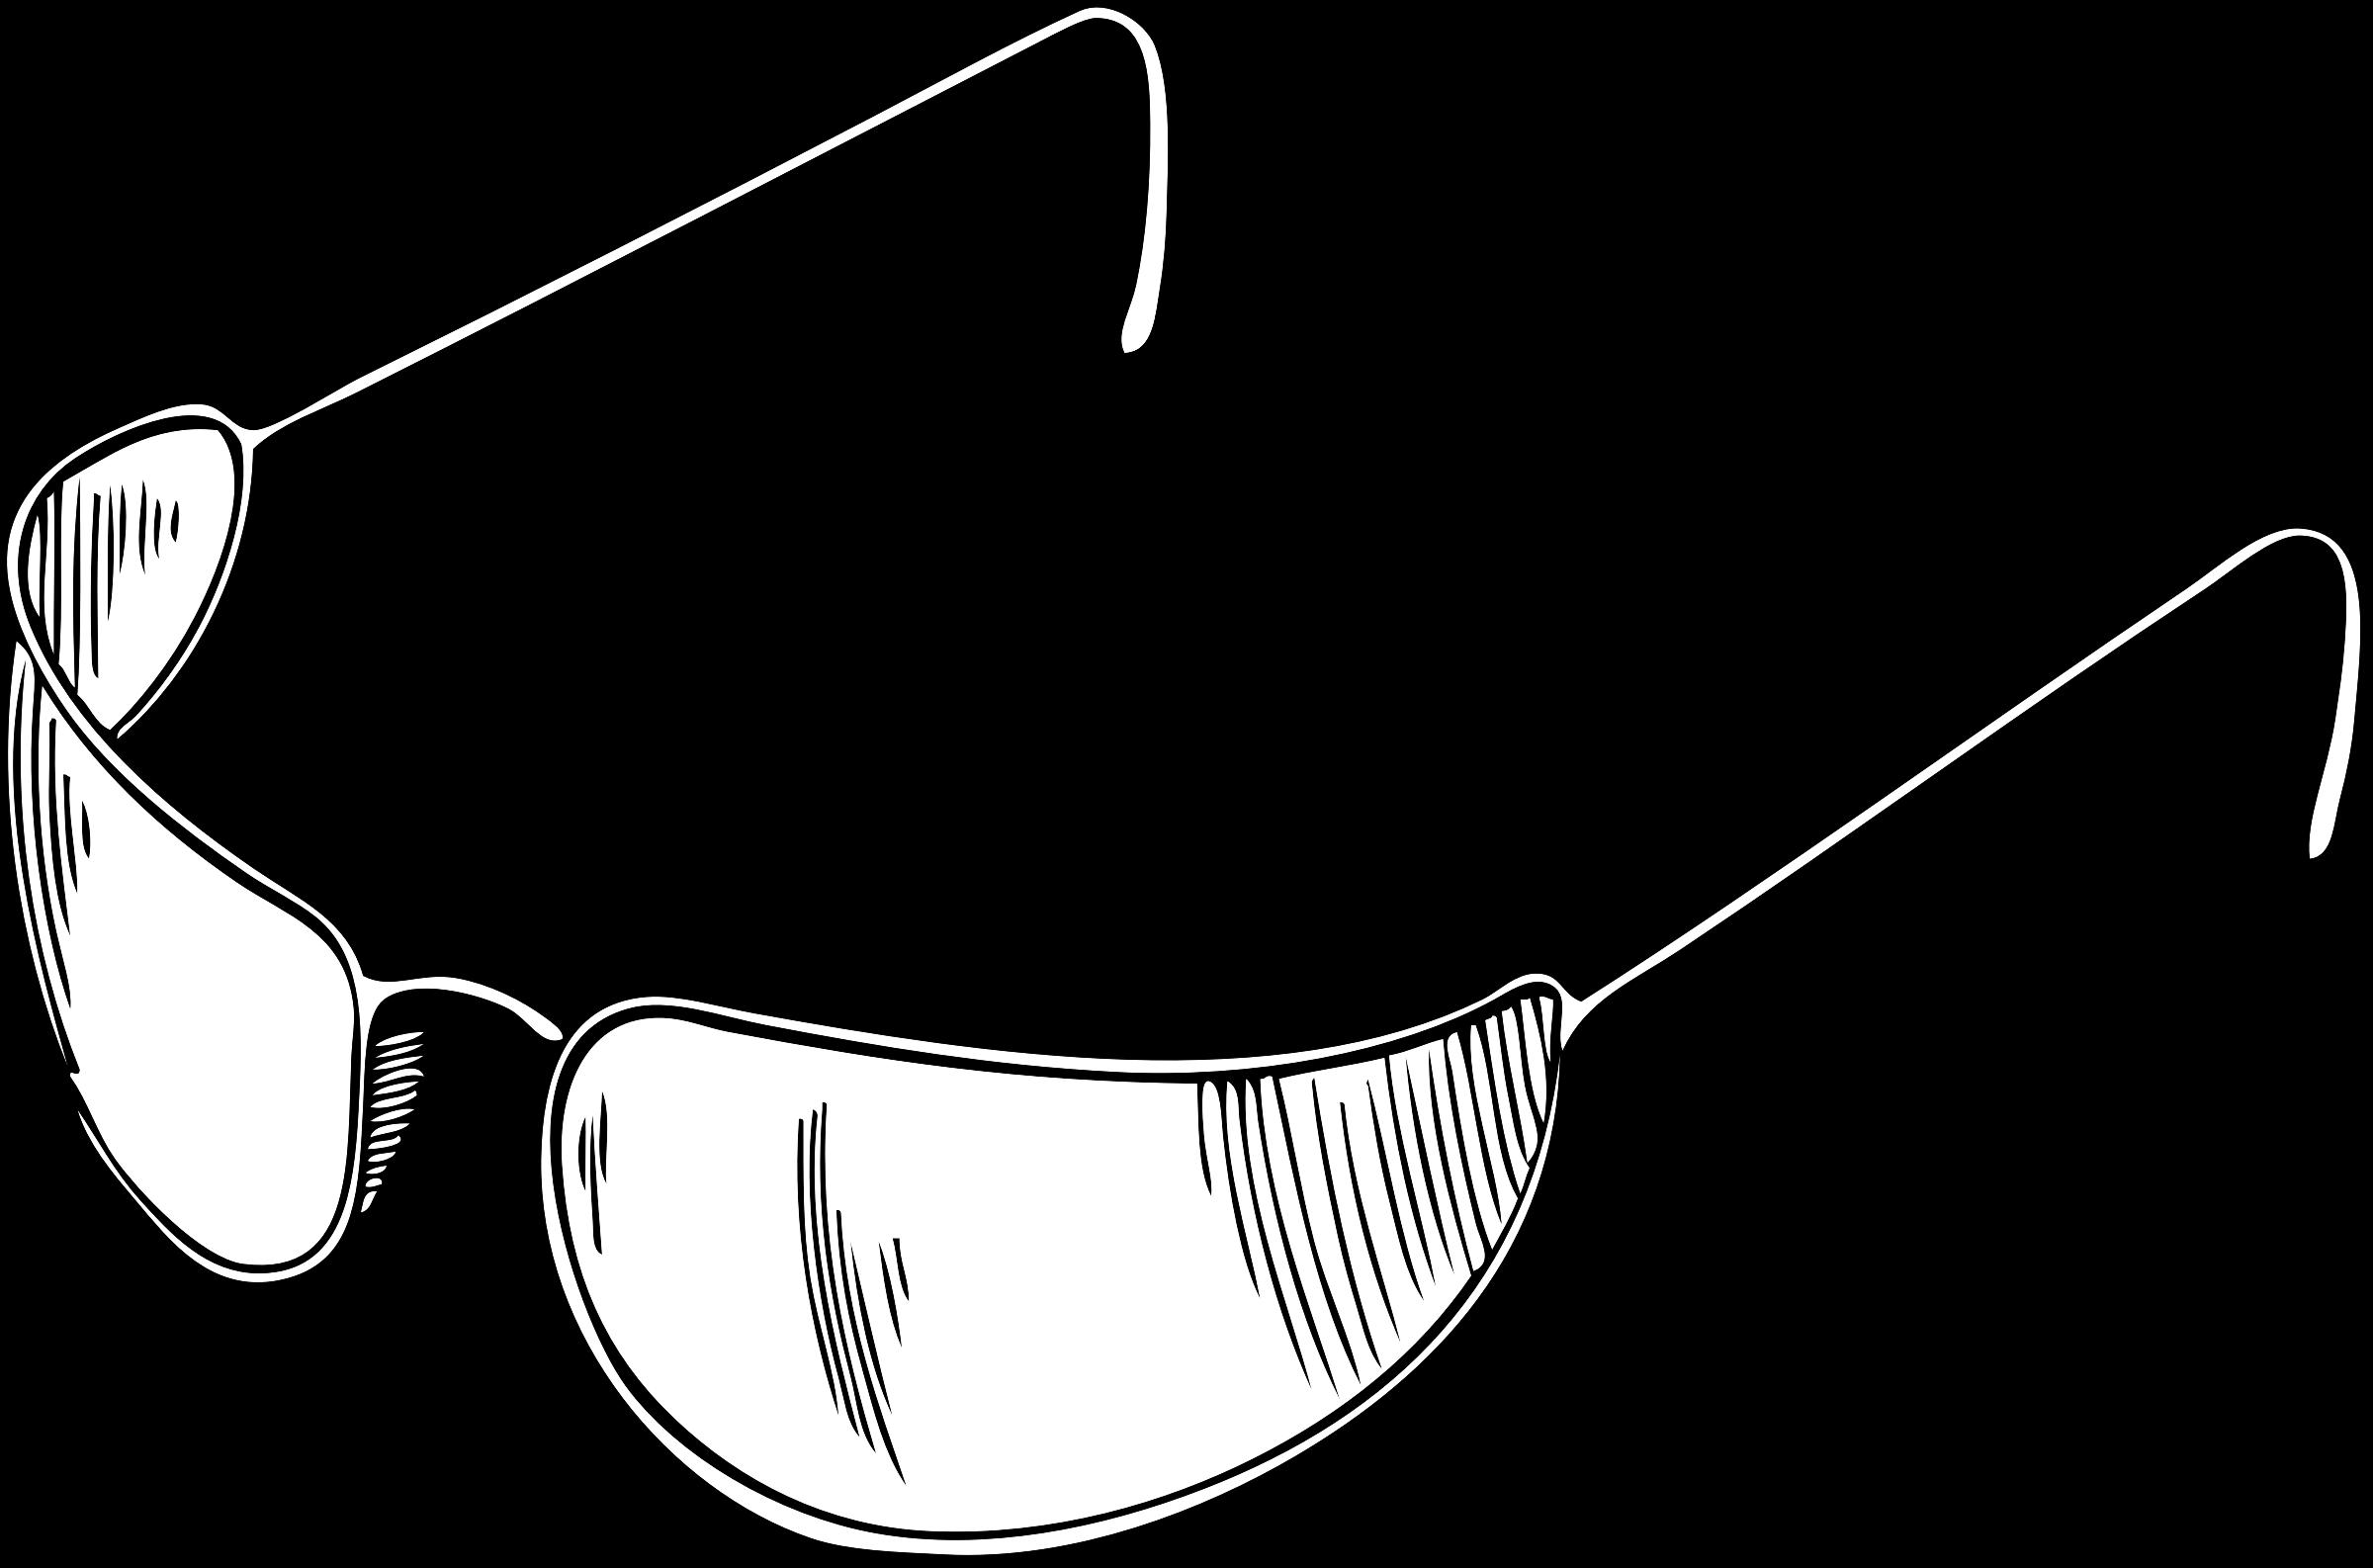 Eyeglasses big image png. Clipart sunglasses outline